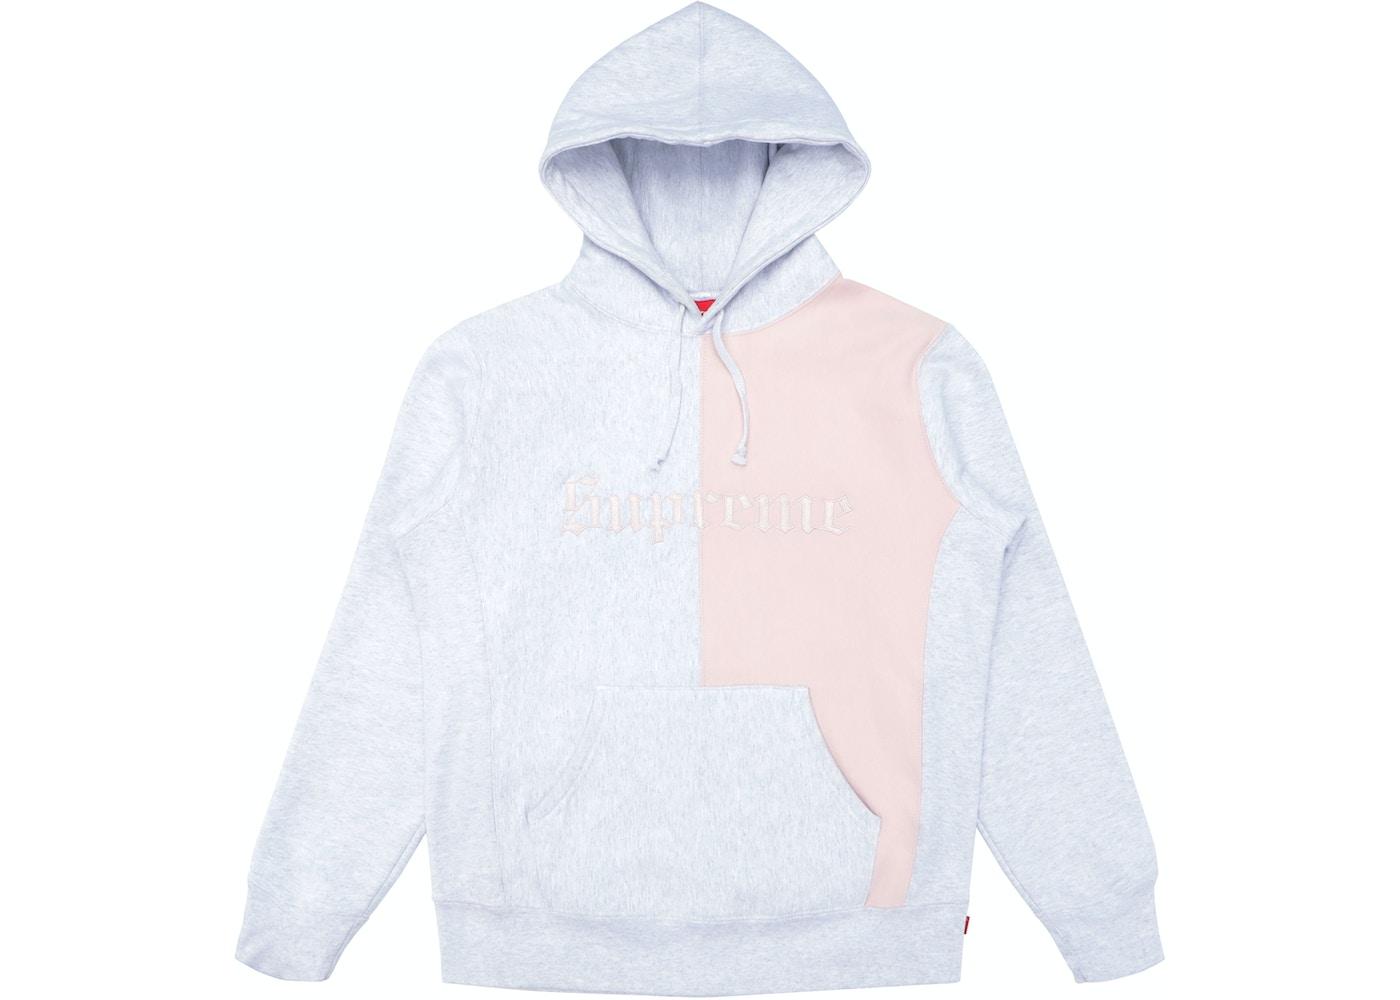 66e1c579fbb HypeAnalyzer · Supreme Split Old English Hooded Sweatshirt Ash Grey